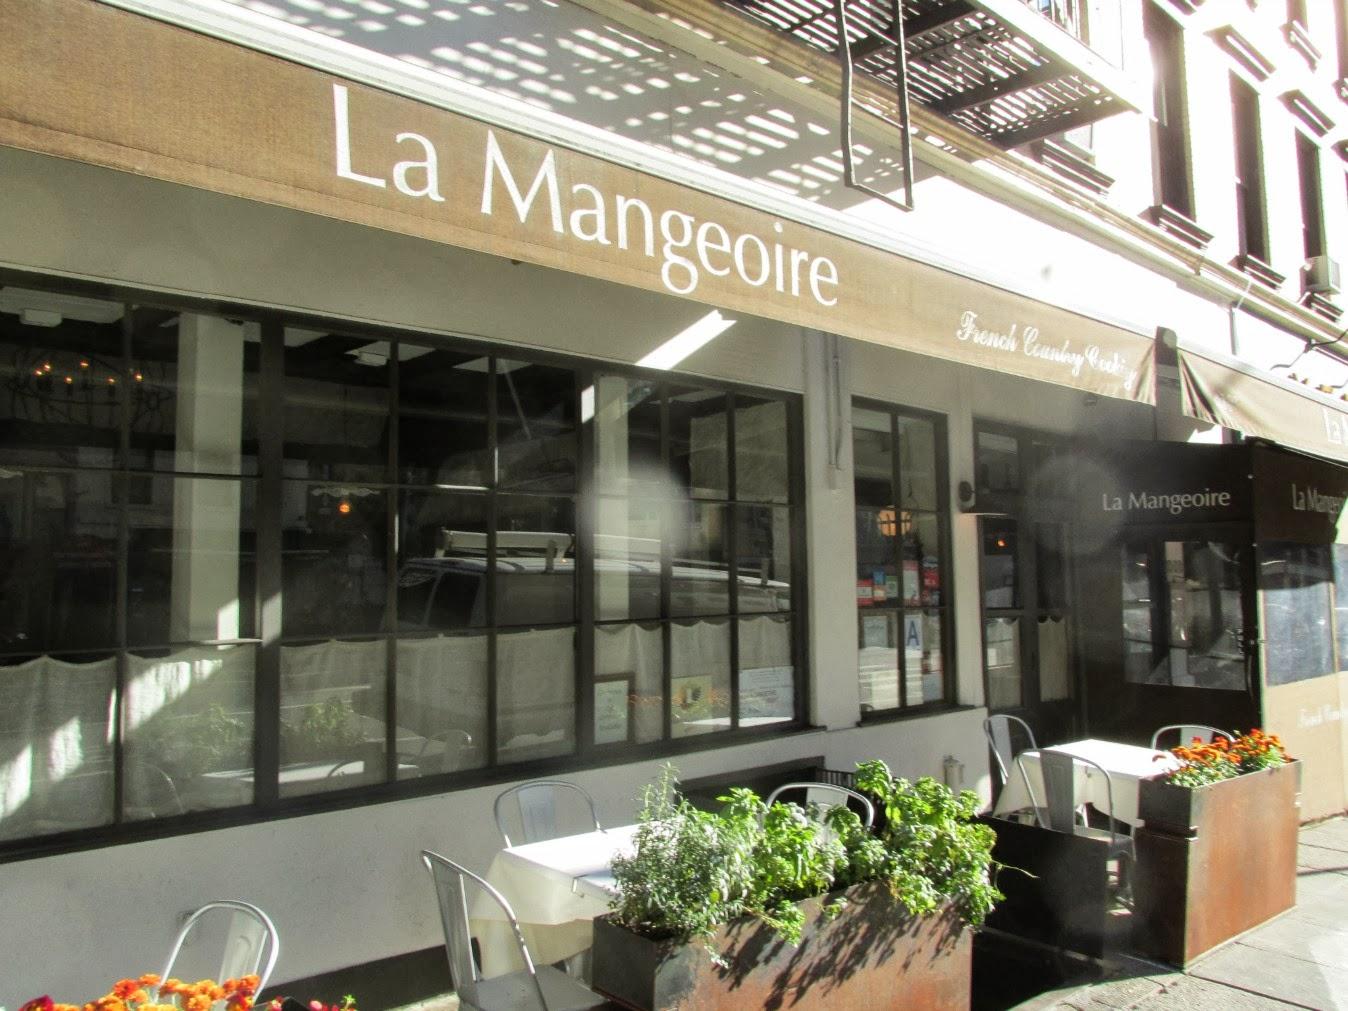 midtown blogger manhattan valley follies la mangeoire midtown east